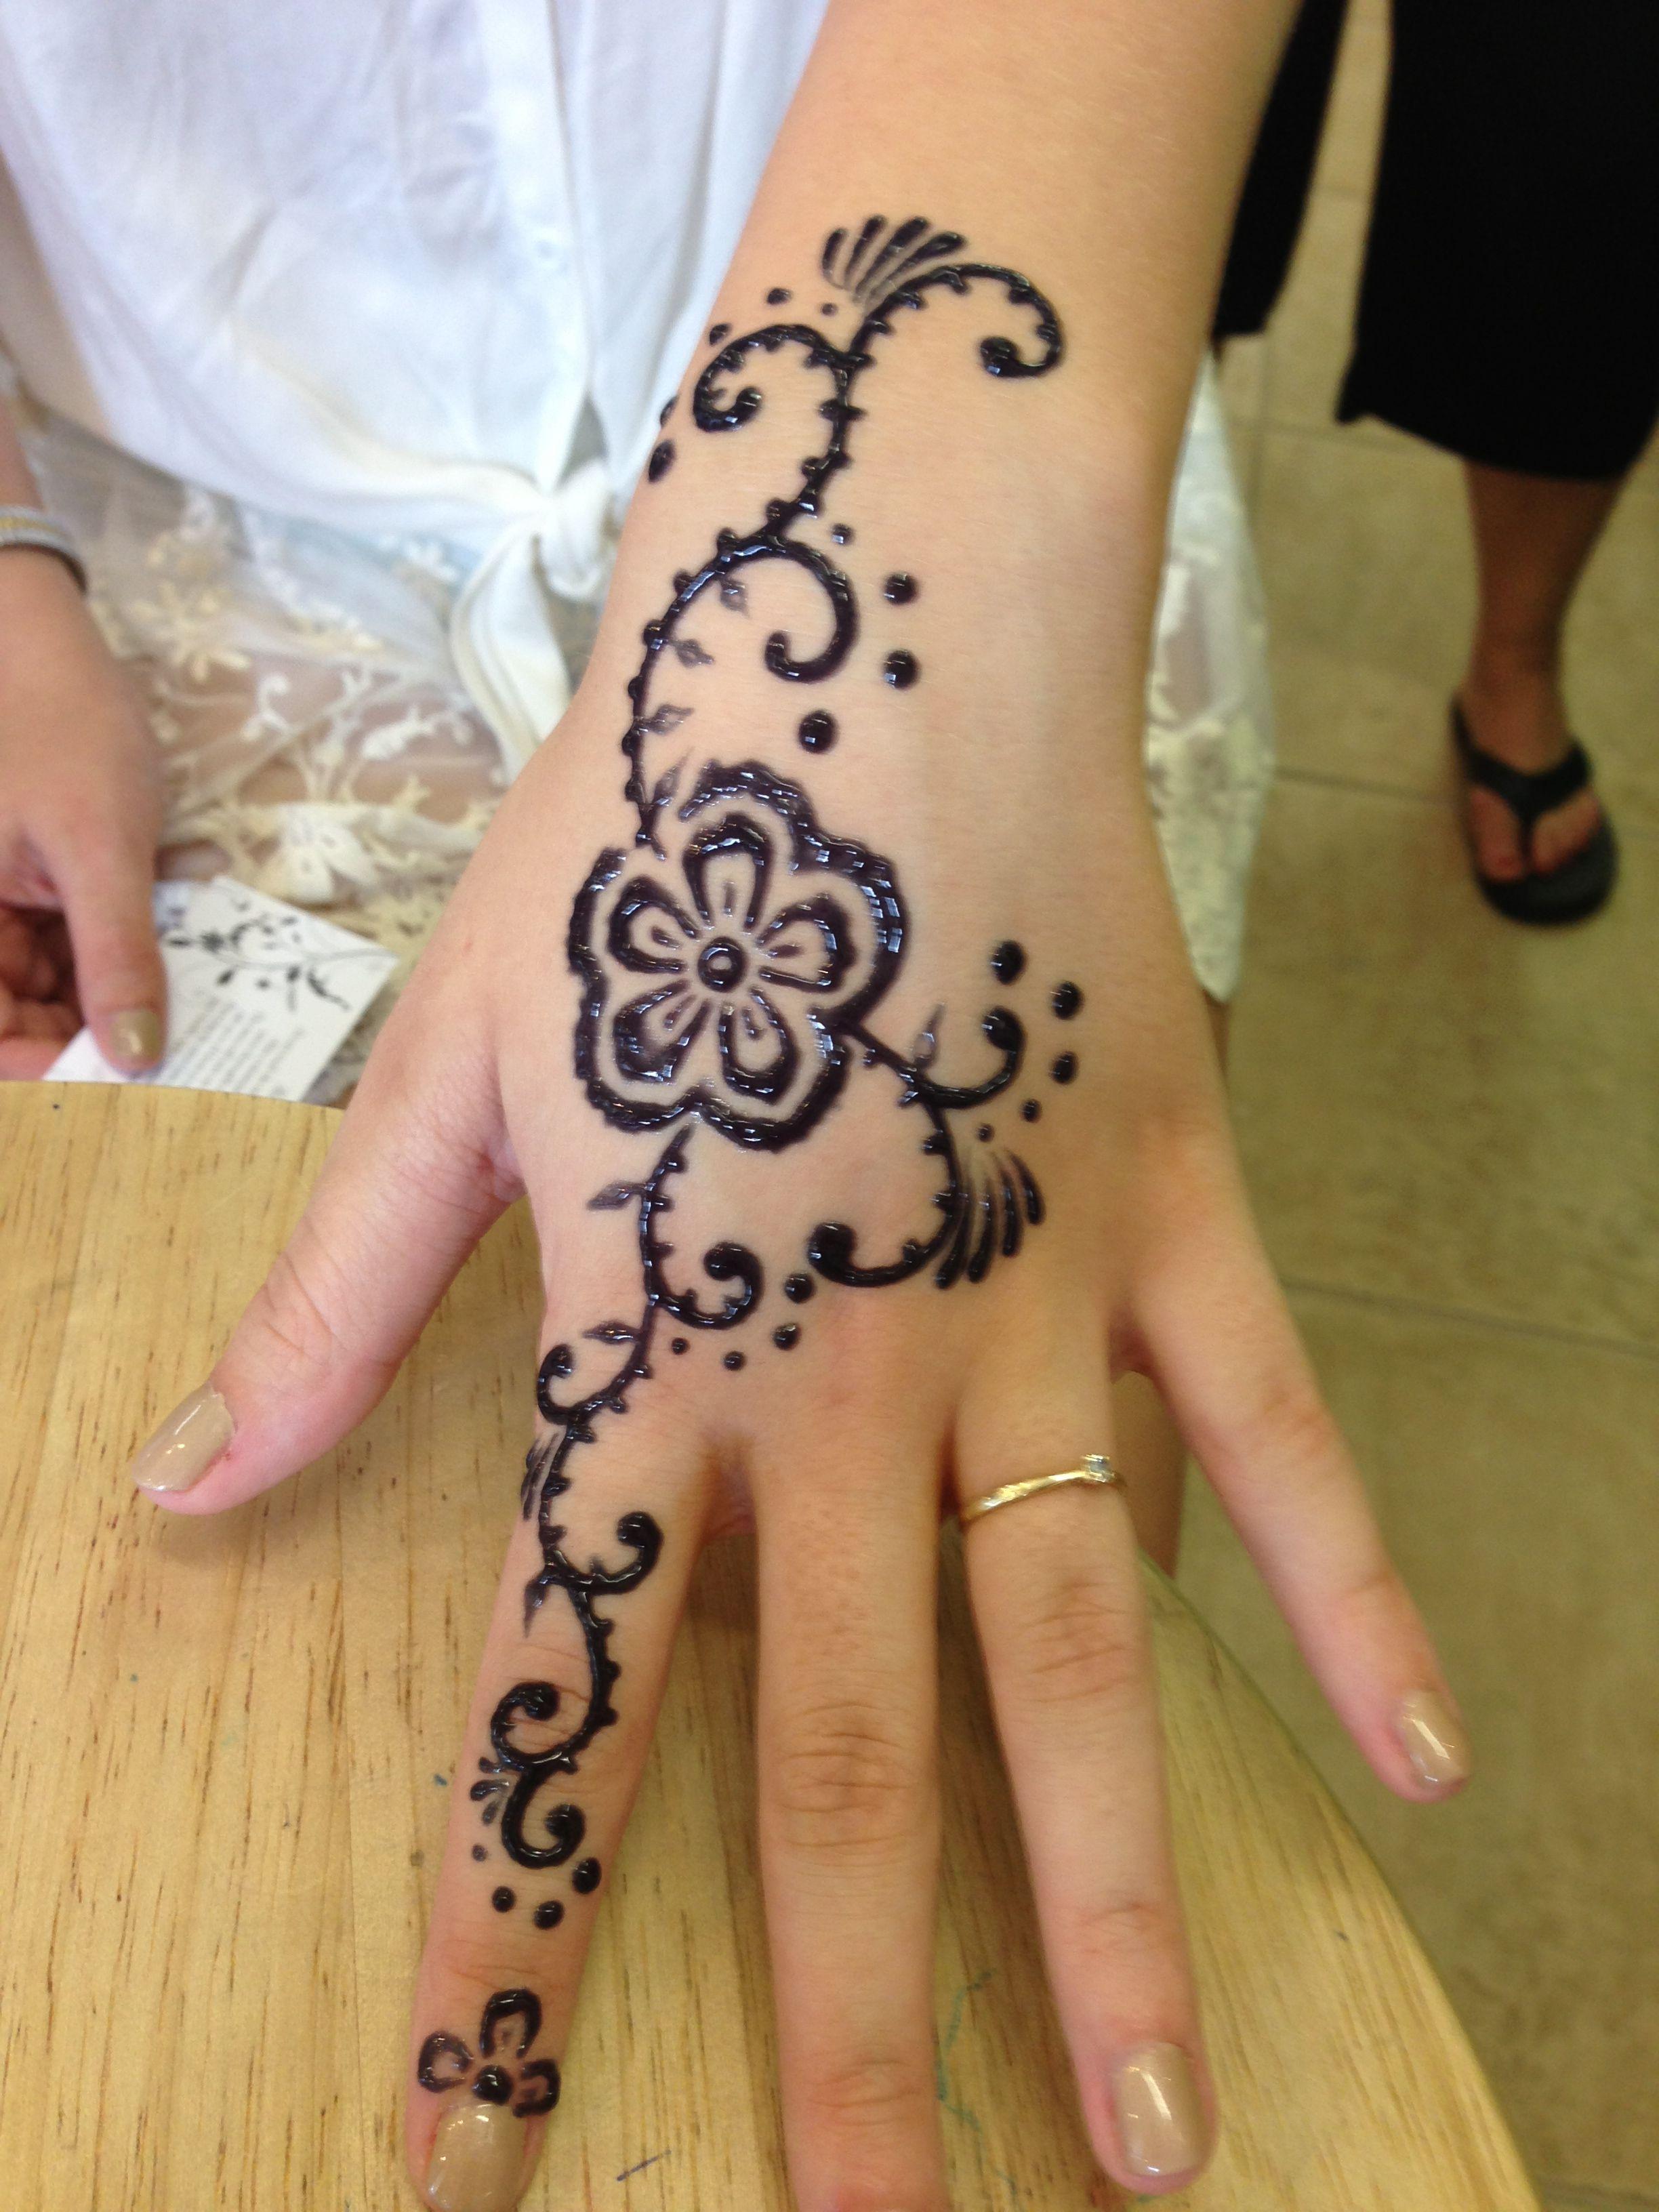 Light uv tattoos henna tattoo for - Freehand Henna Tattoo On The Hand